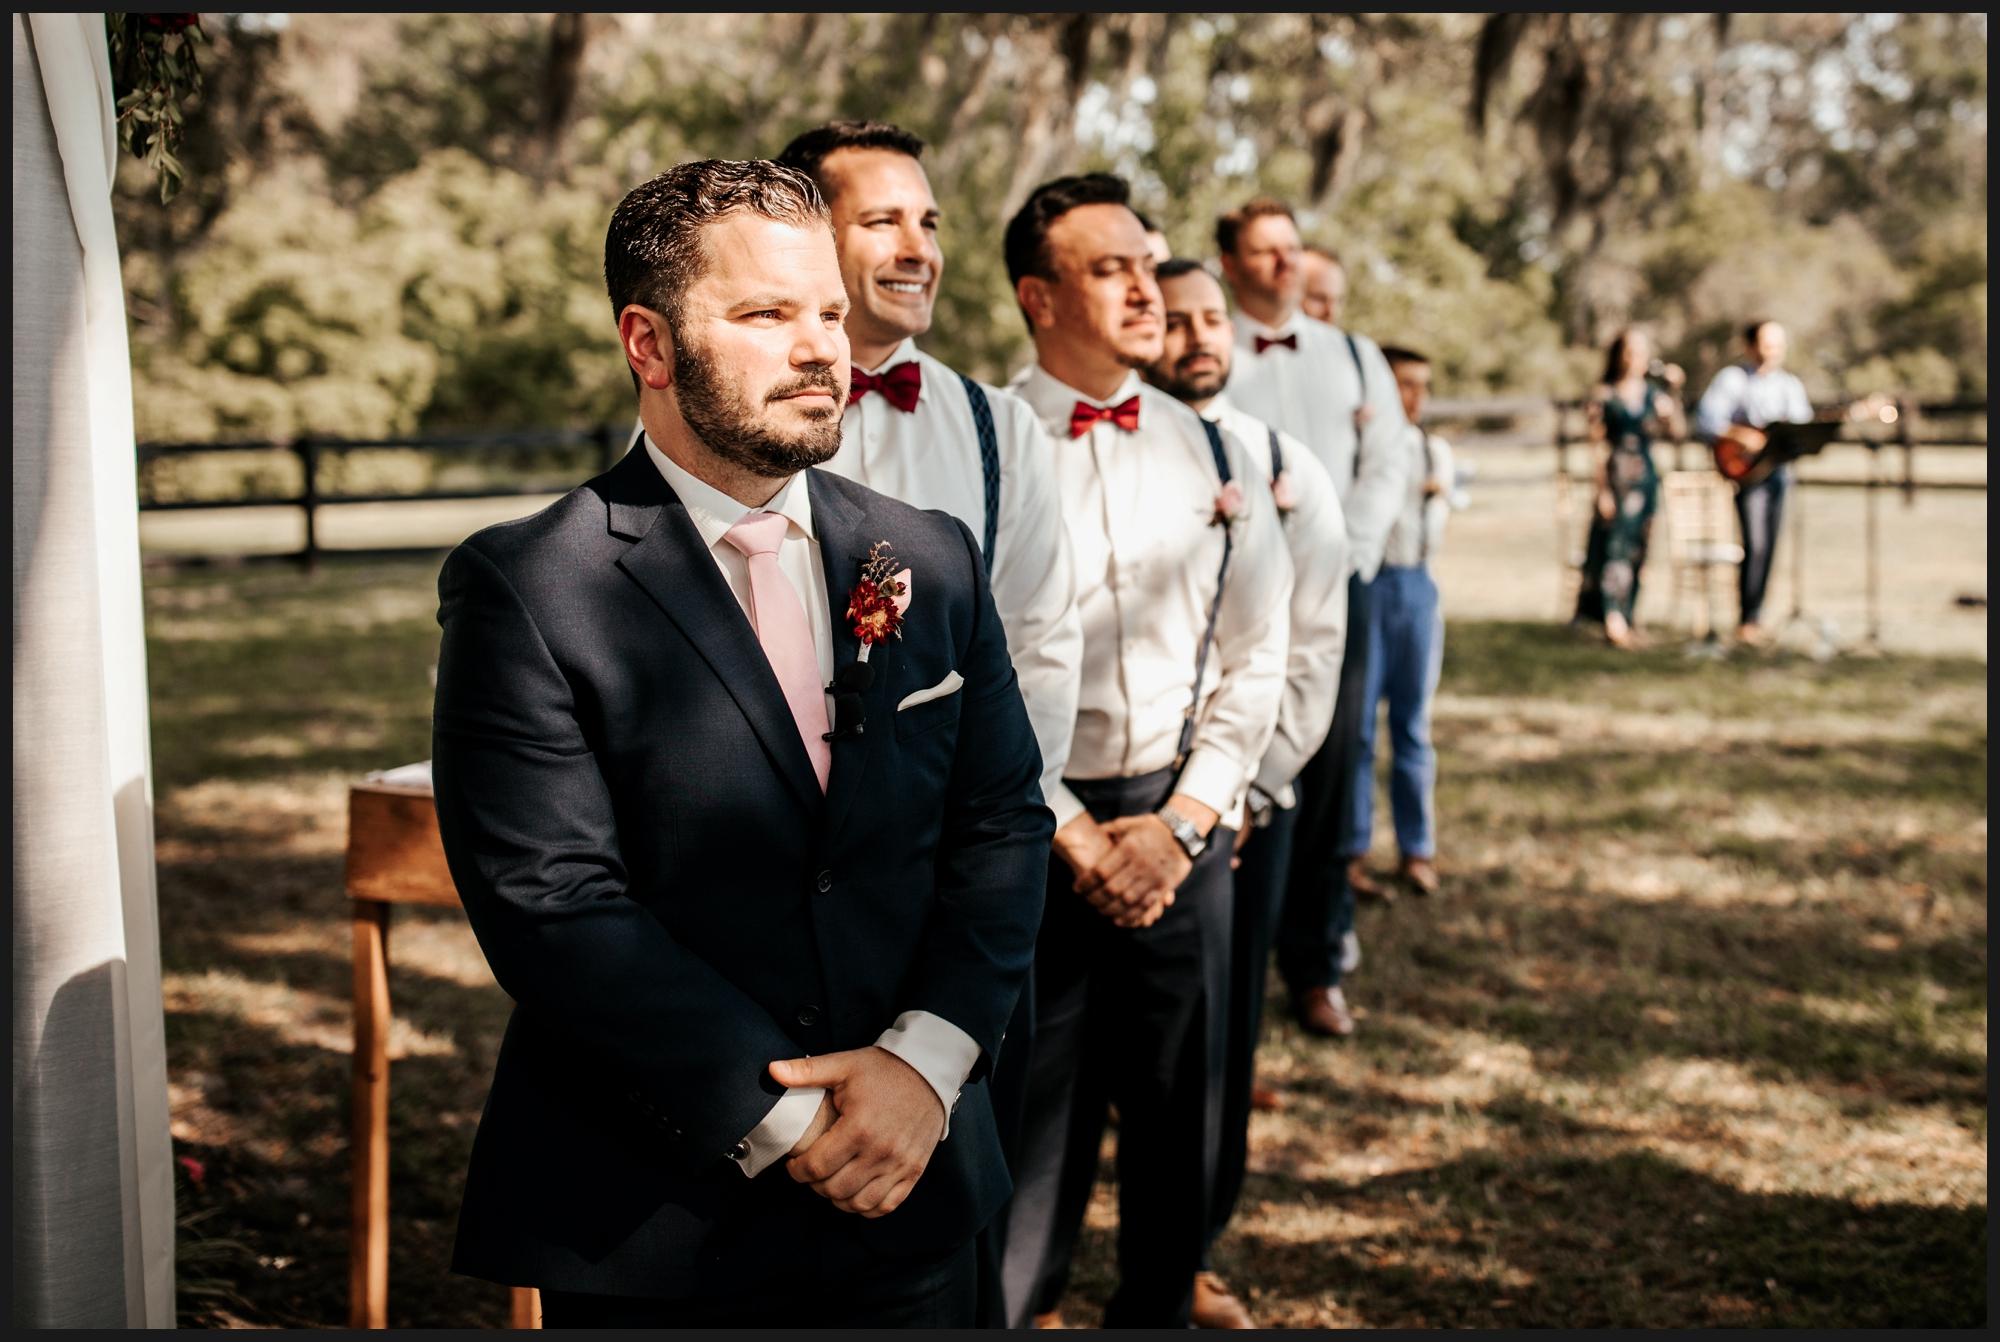 Orlando-Wedding-Photographer-destination-wedding-photographer-florida-wedding-photographer-hawaii-wedding-photographer_0593.jpg